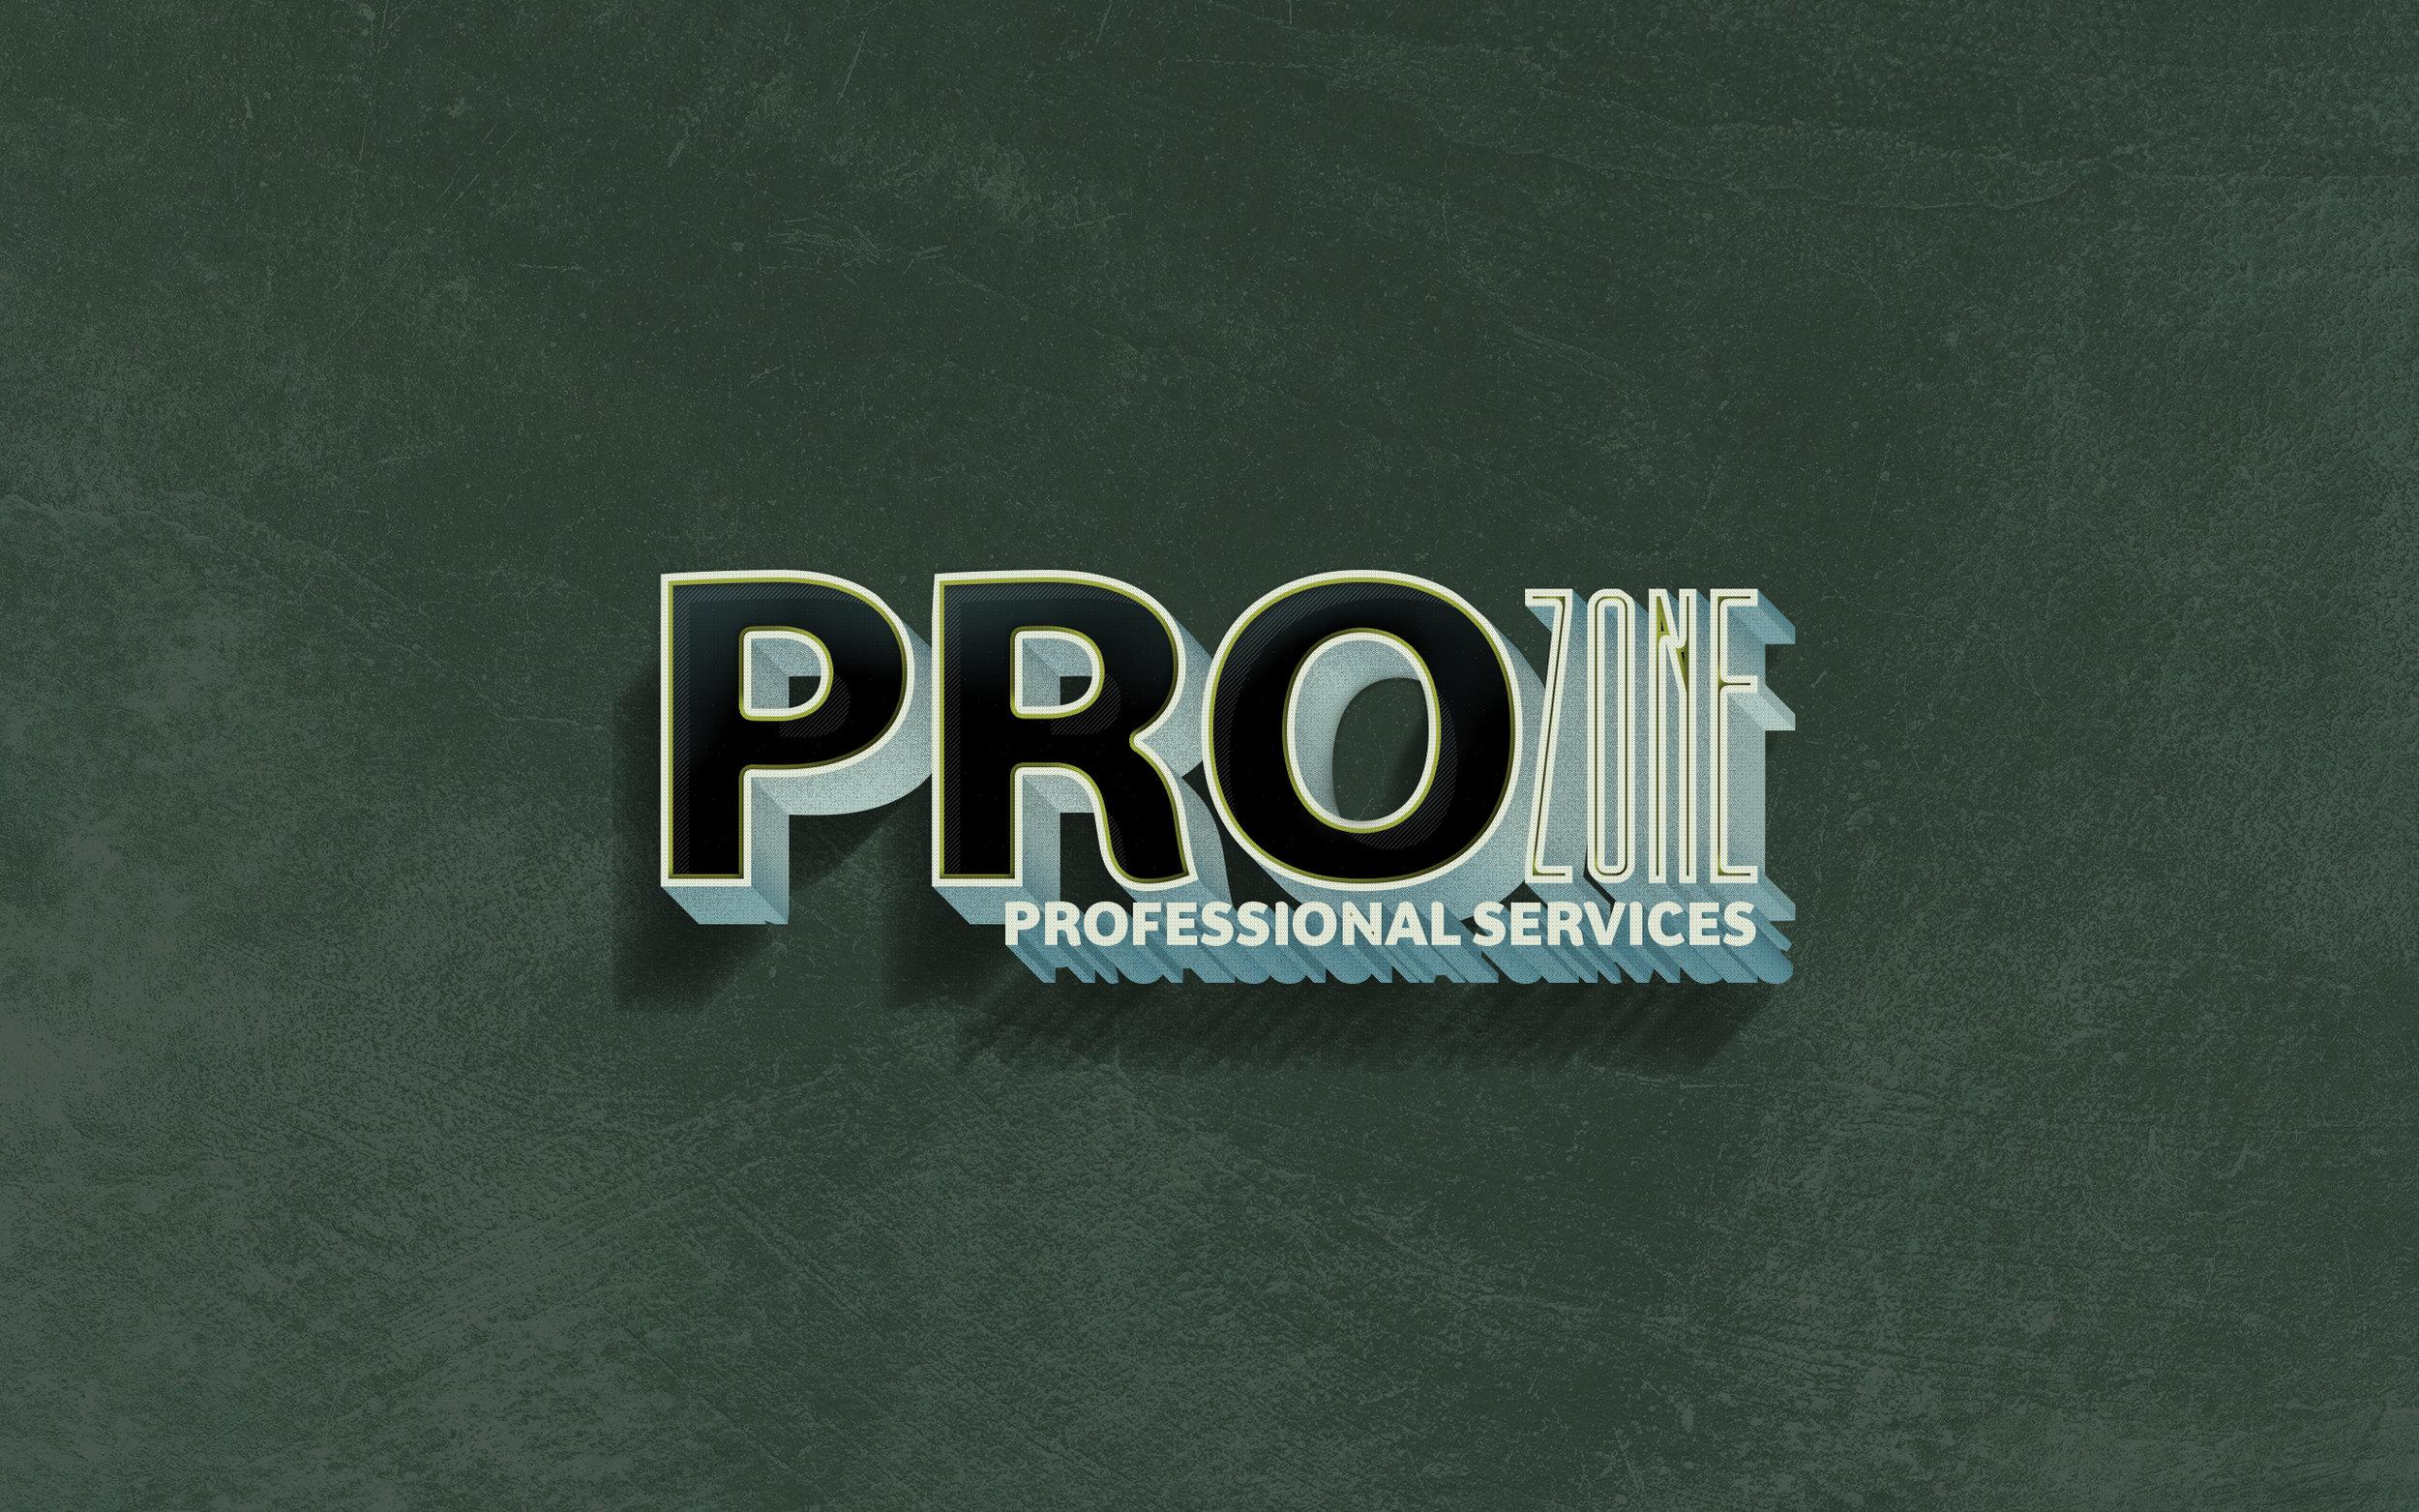 Prozone Layers.jpg